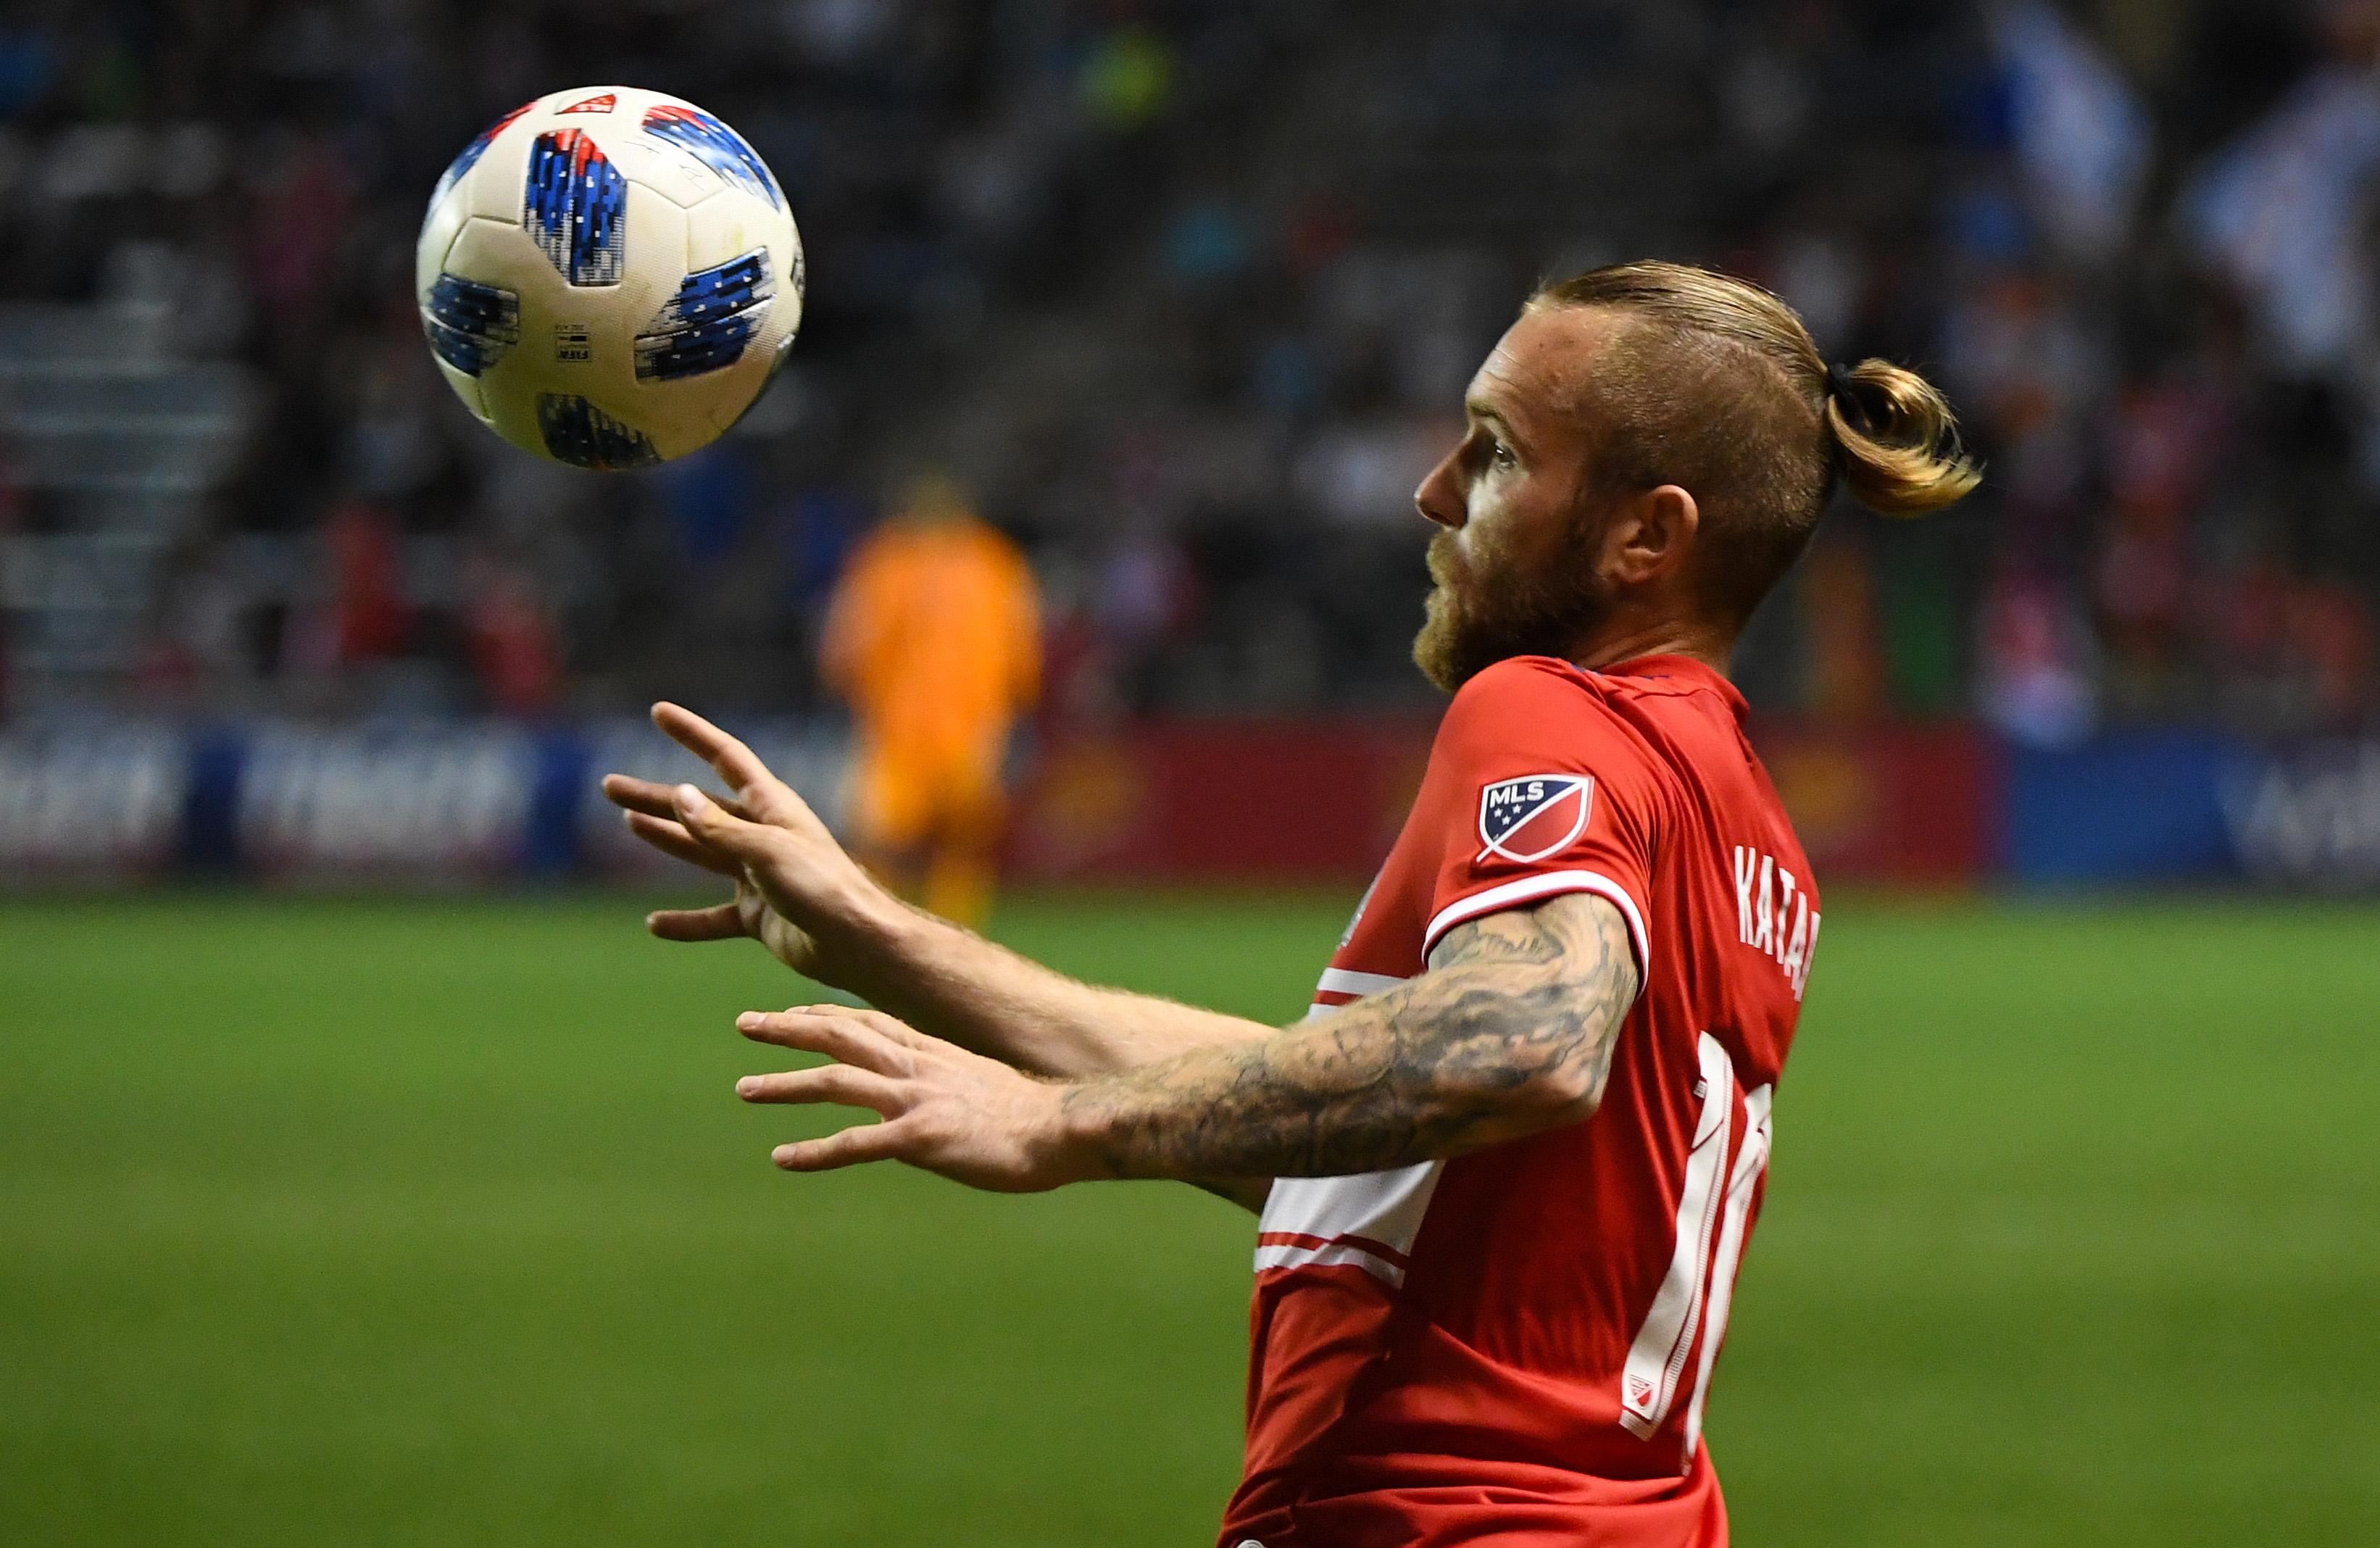 MLS: Atlanta United FC at Chicago Fire